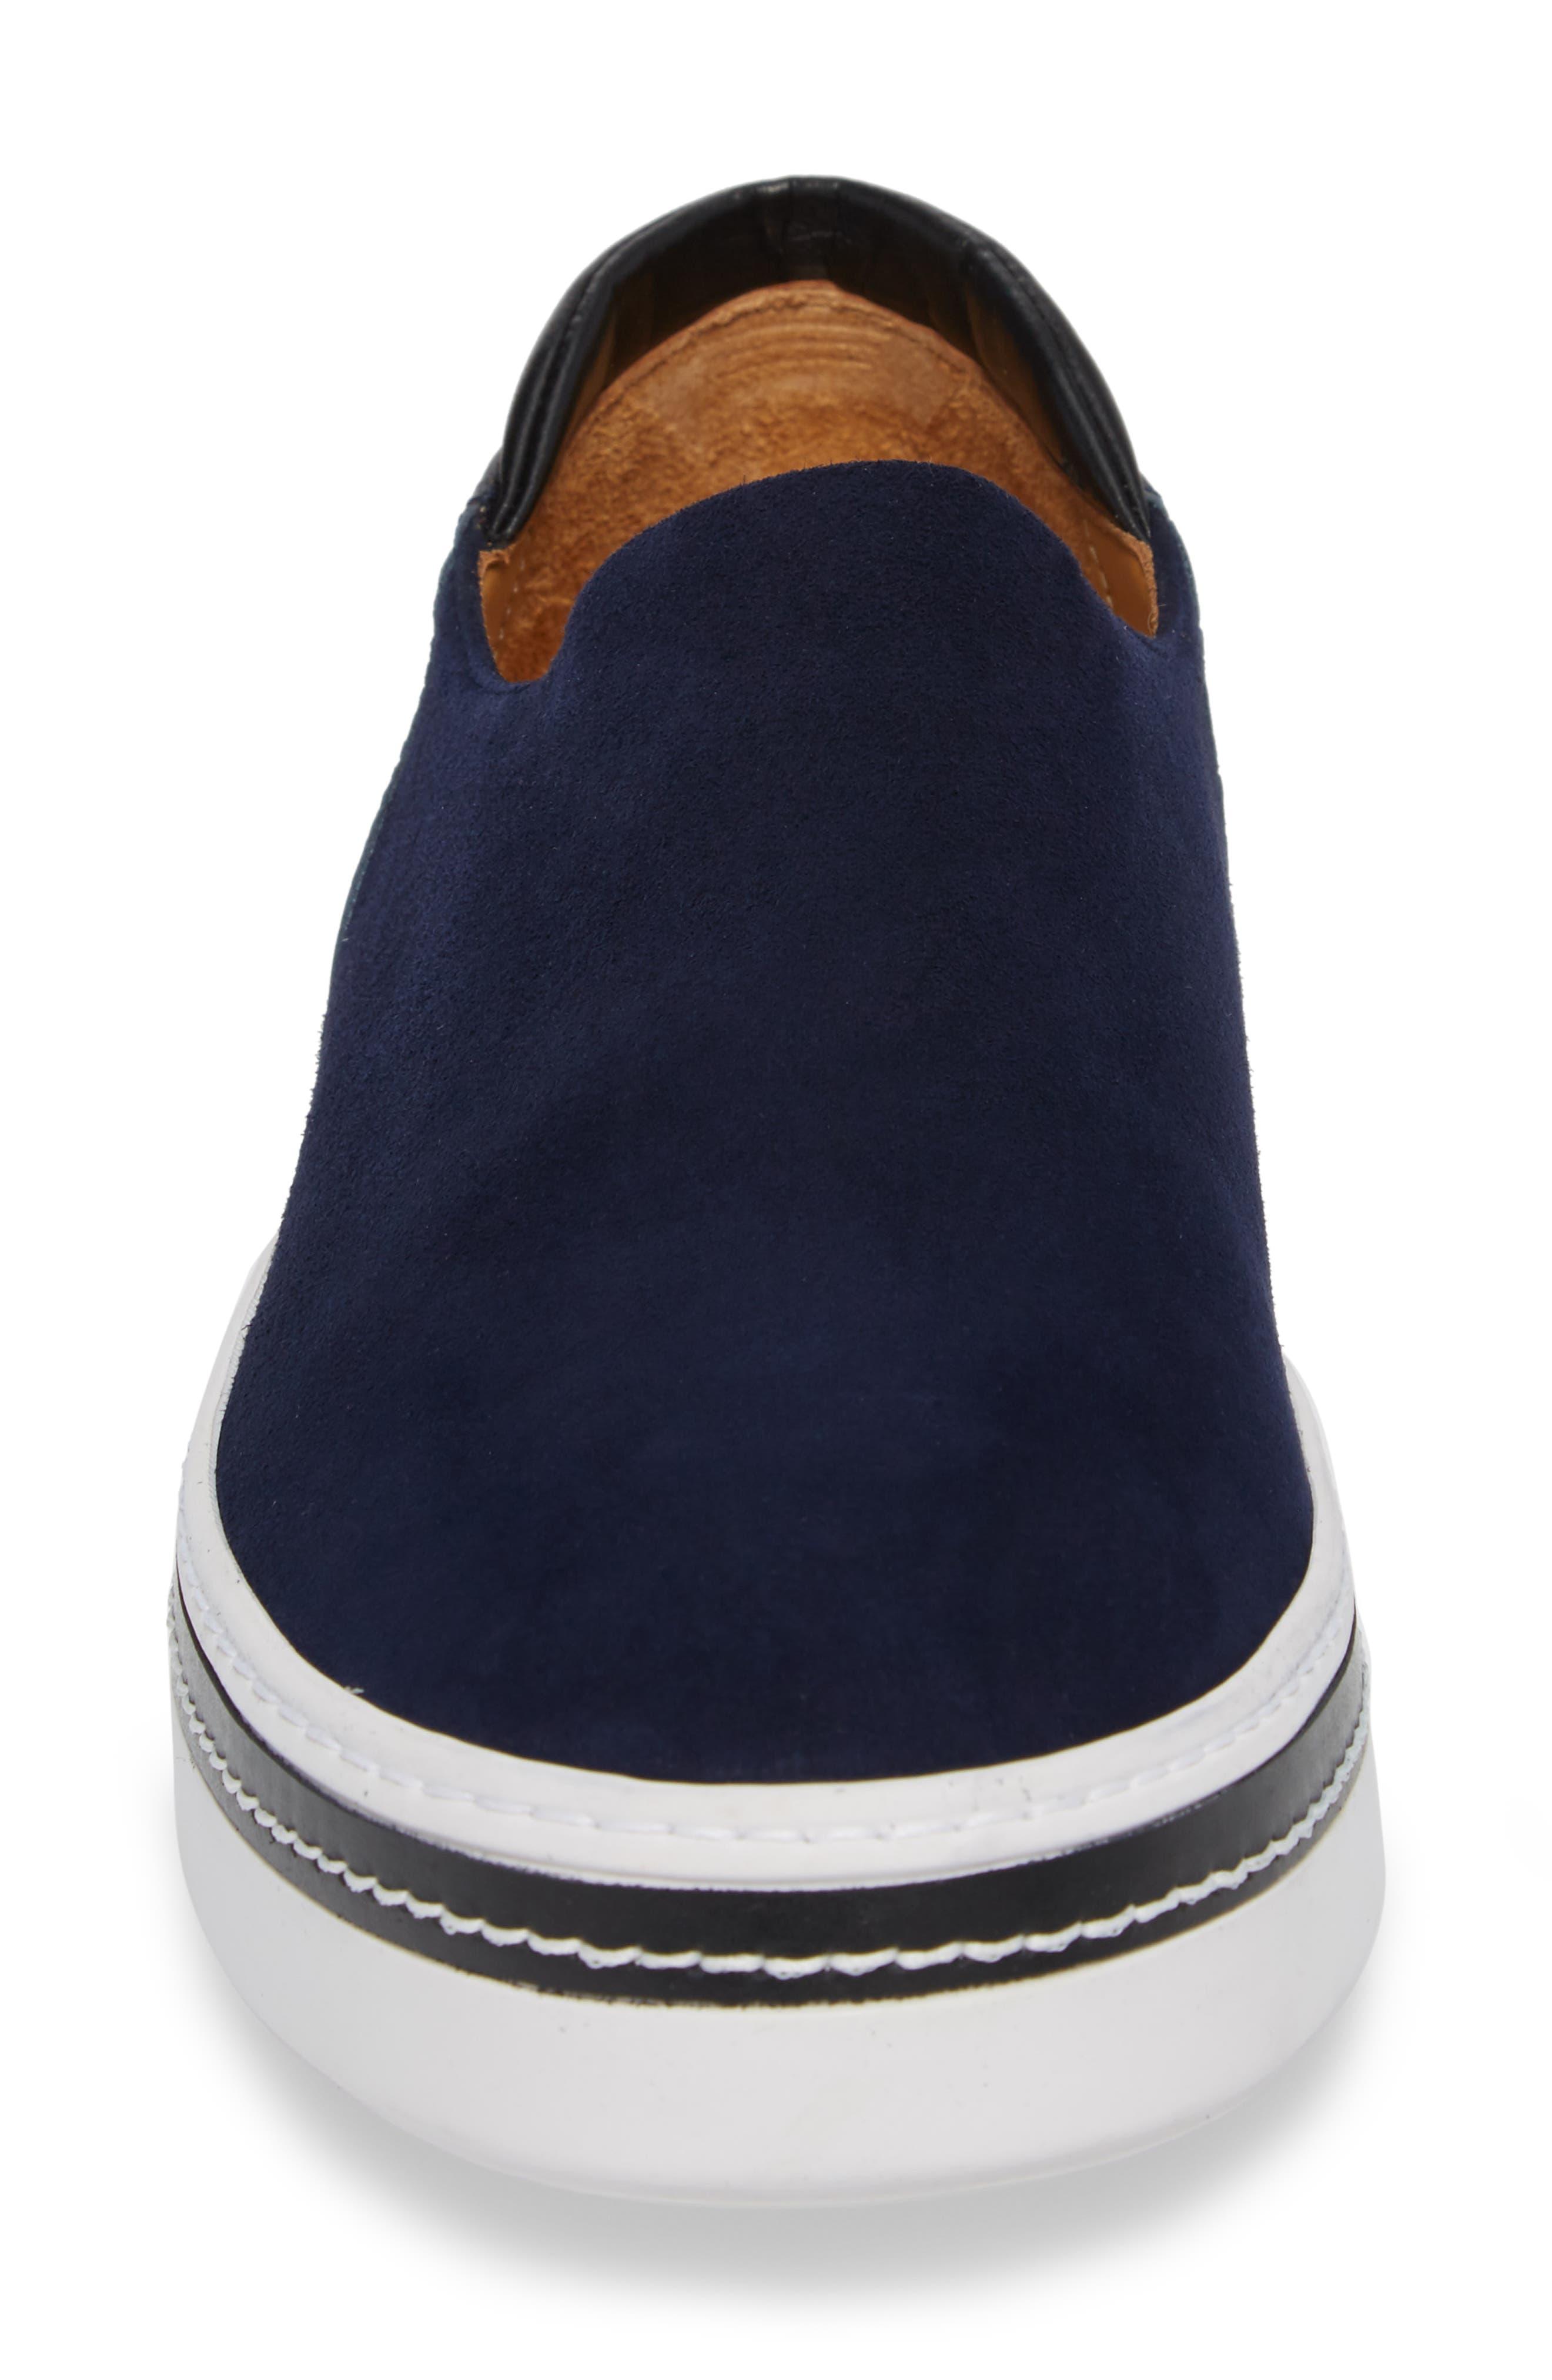 Stan Slip-On Sneaker,                             Alternate thumbnail 4, color,                             Midnight Blue Suede